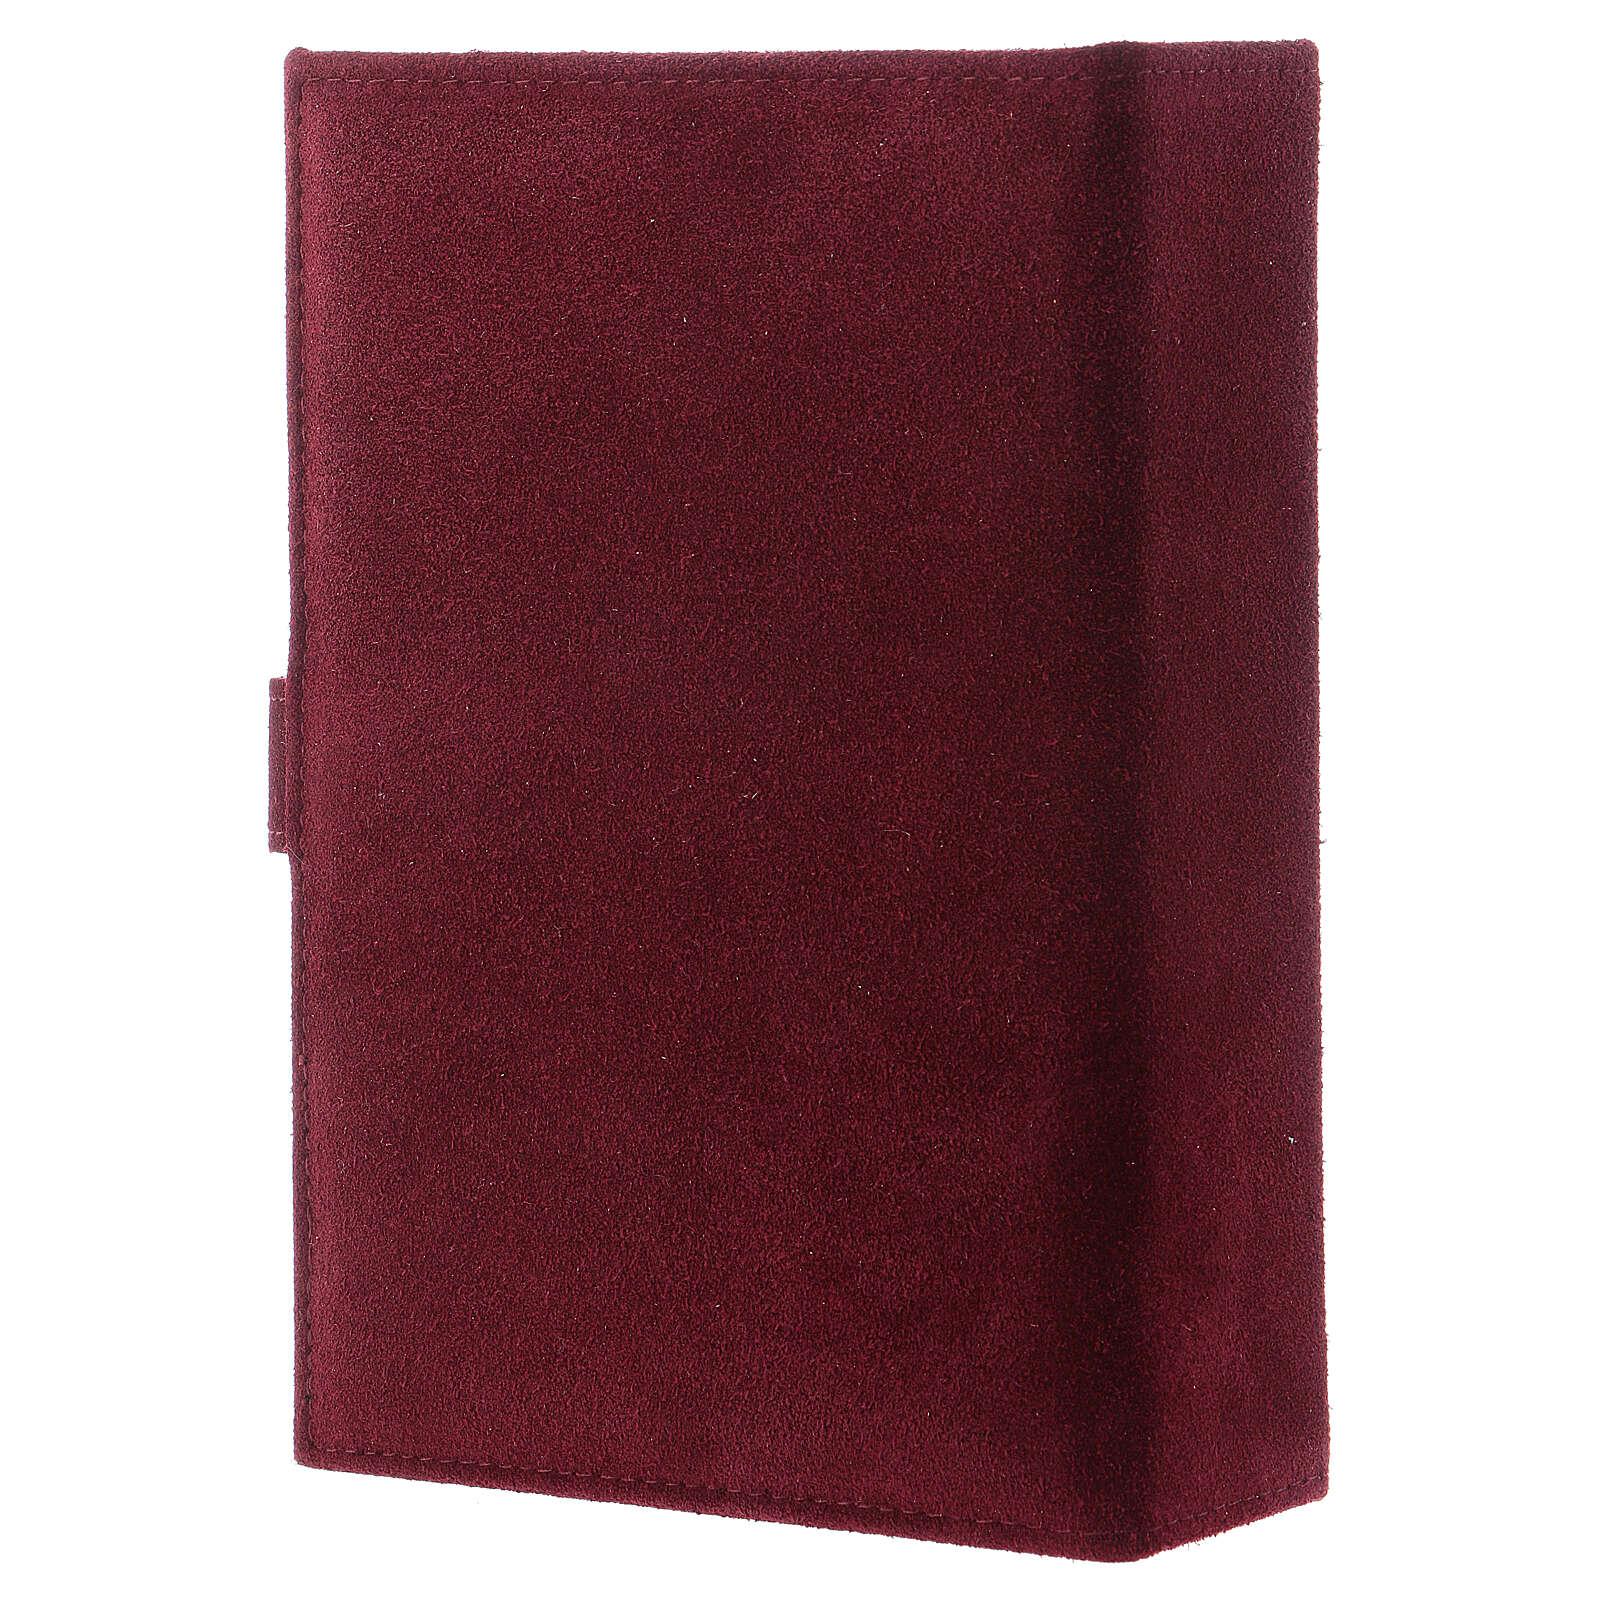 Custodia Bibbia Gerusalemme pelle scamosciata bordeaux 4